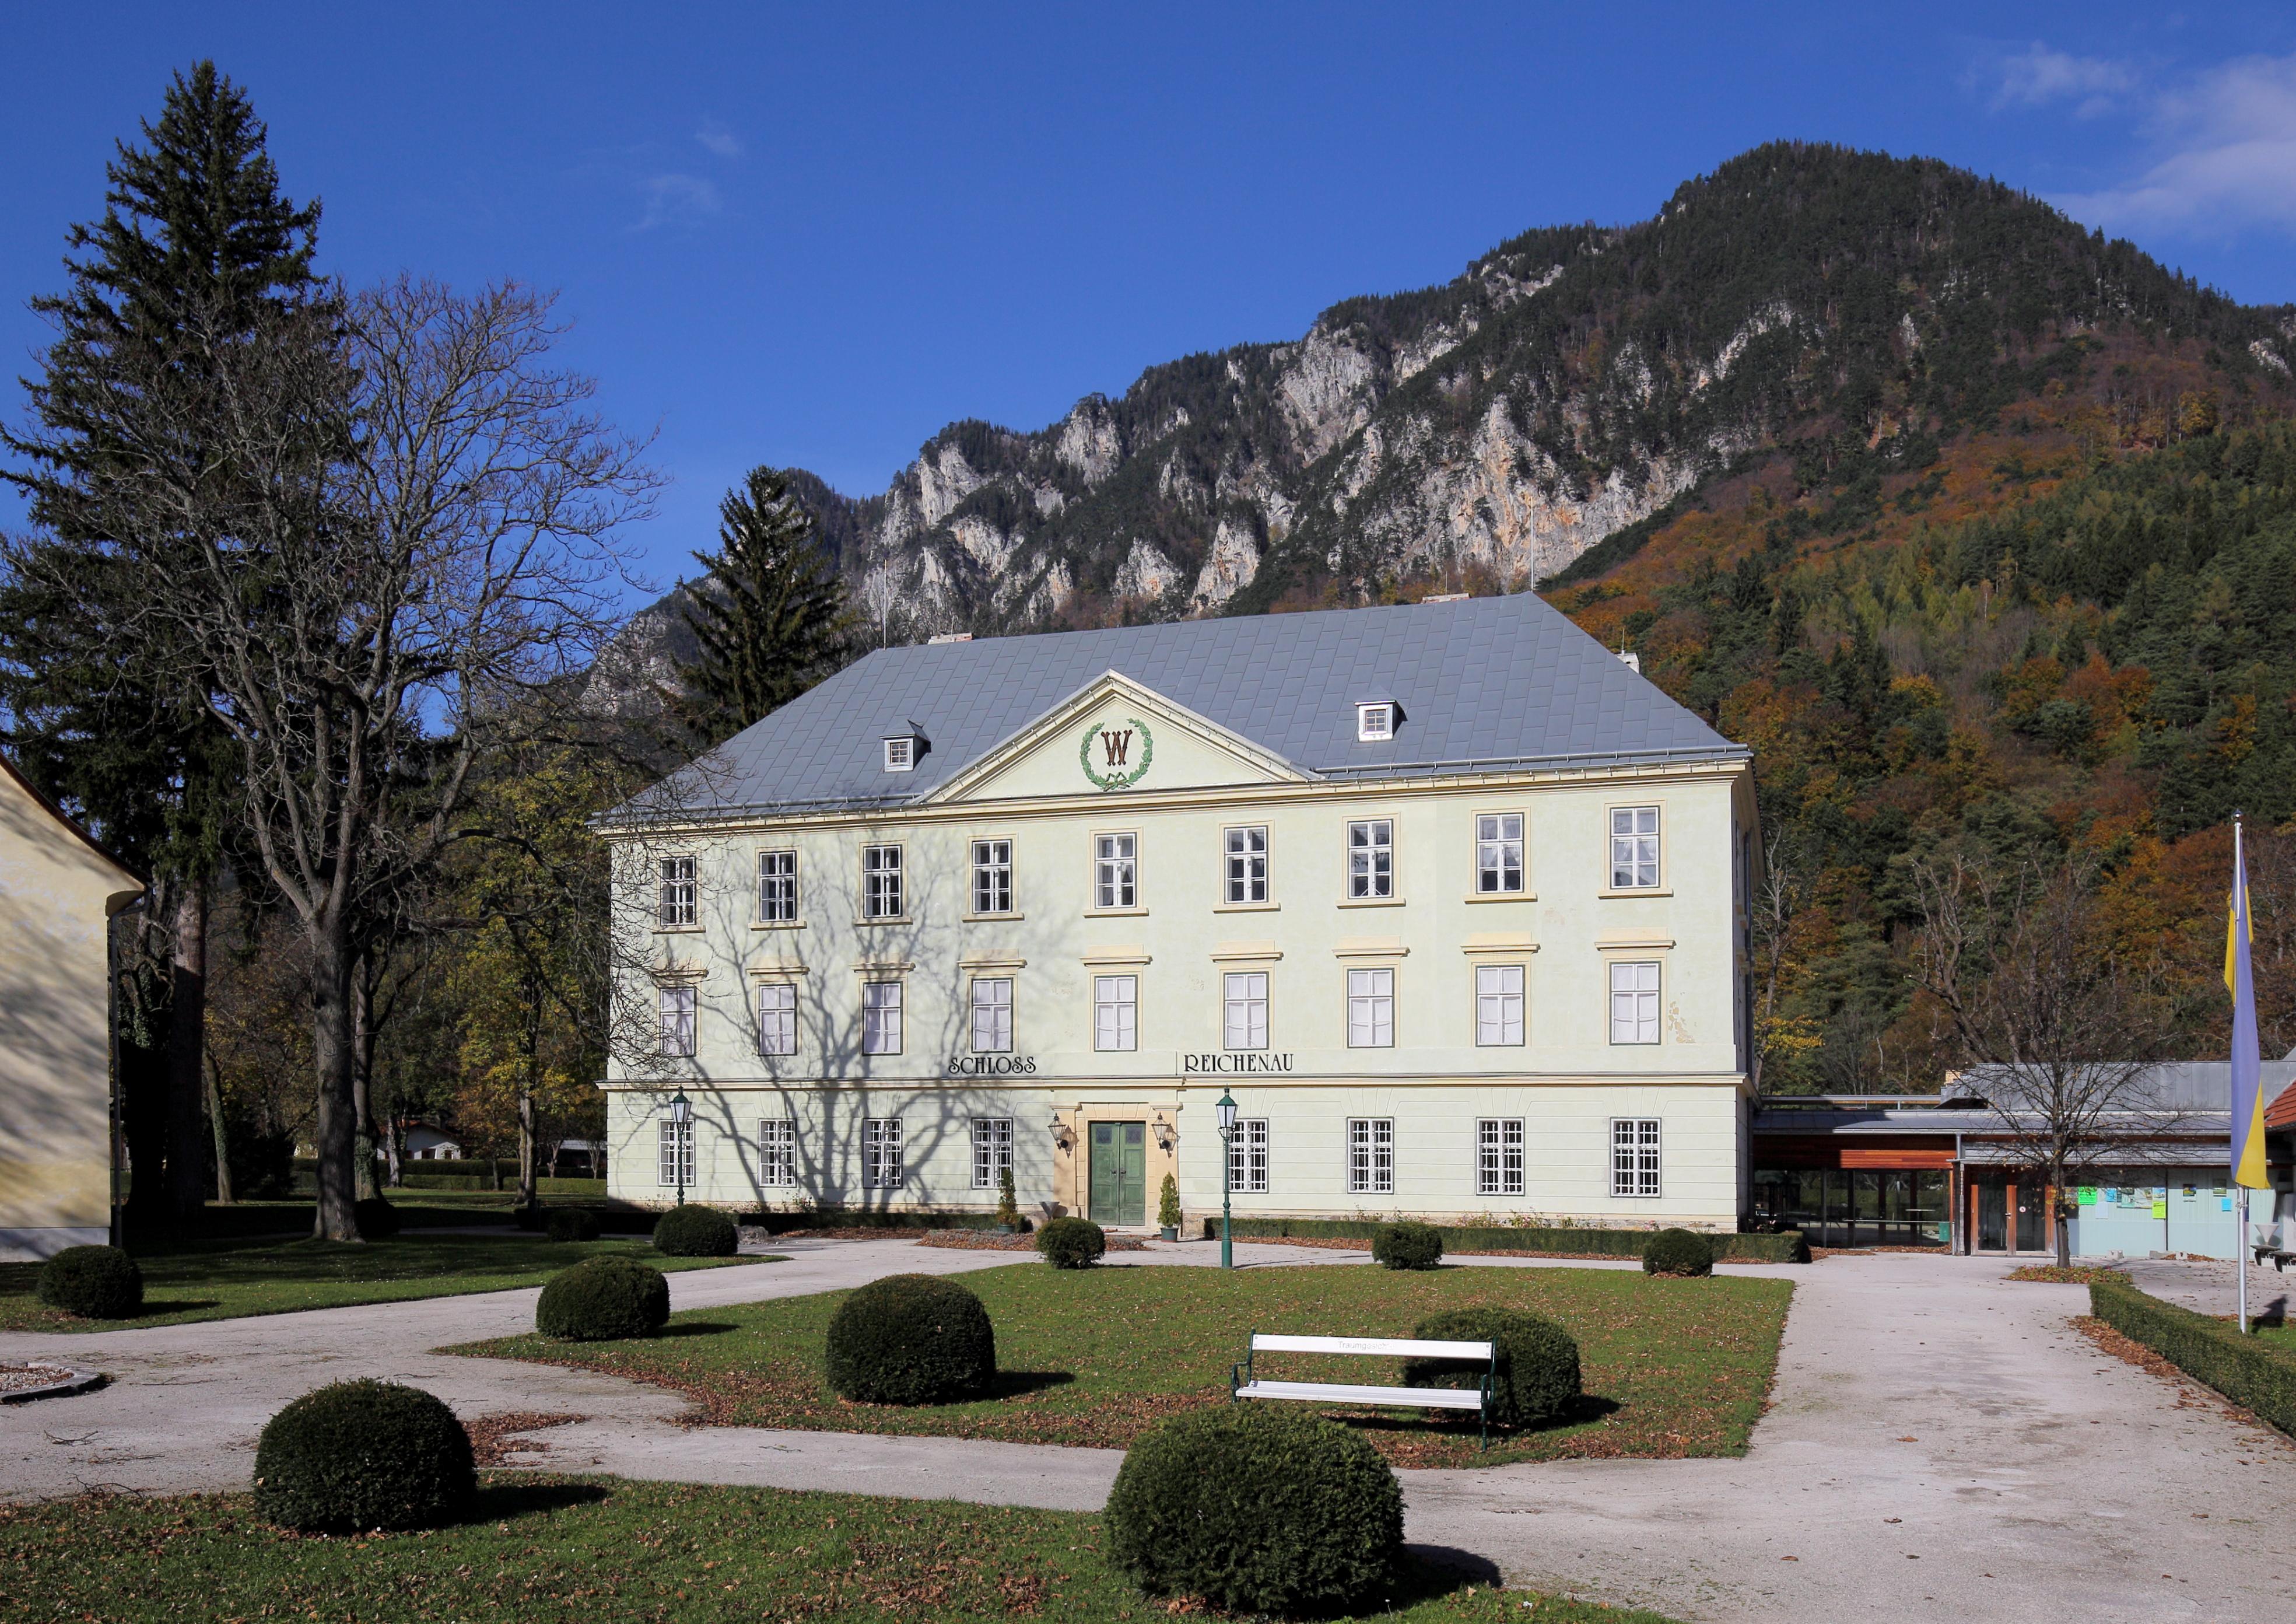 Reichenau an der Rax   Wien, rk. Erzdizese (stl